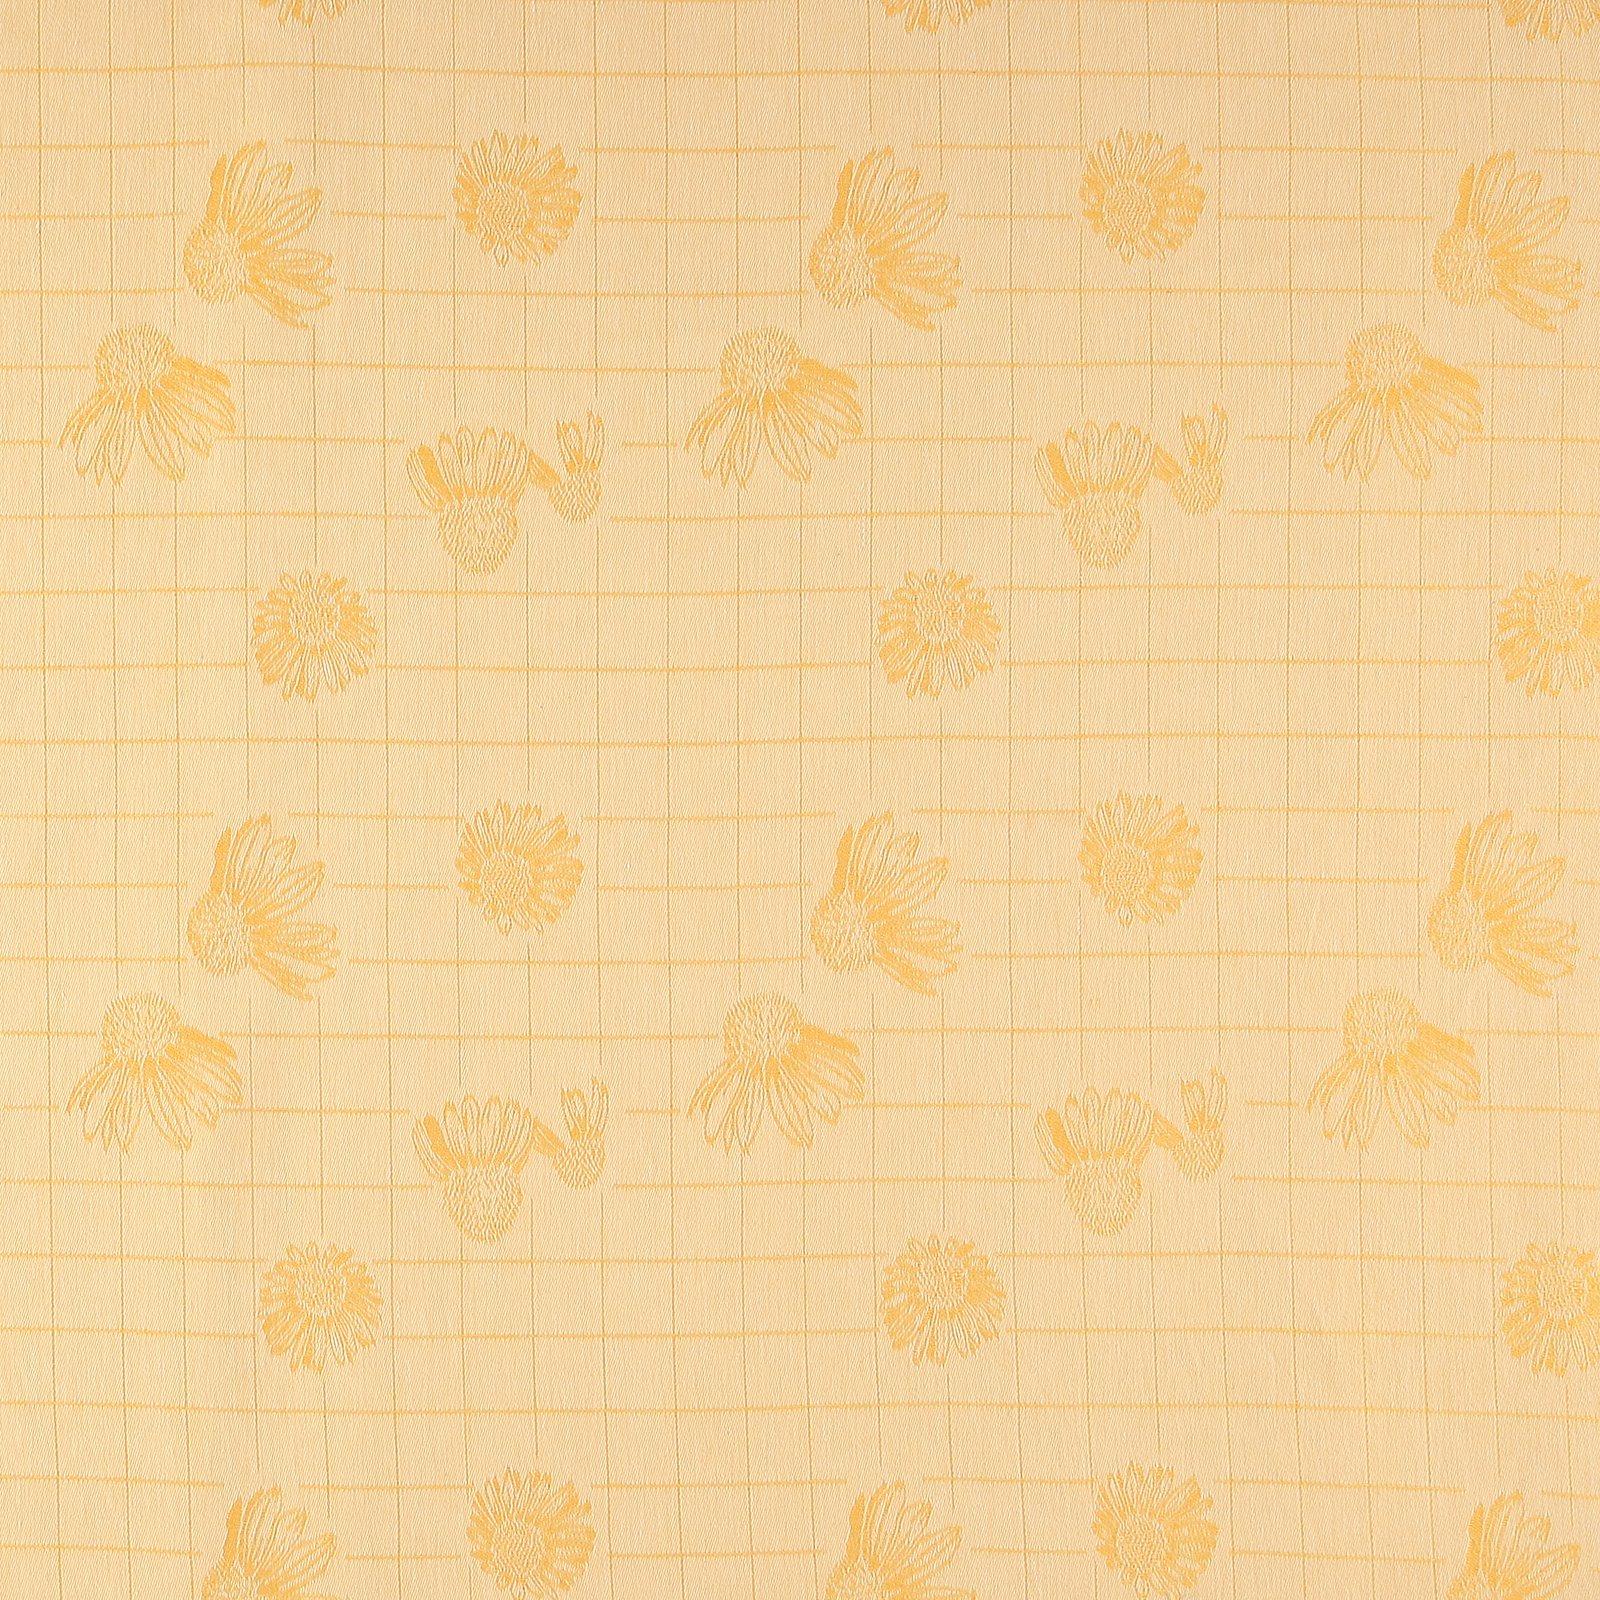 Organic jacquard sand w yellow flowers 816233_pack_sp